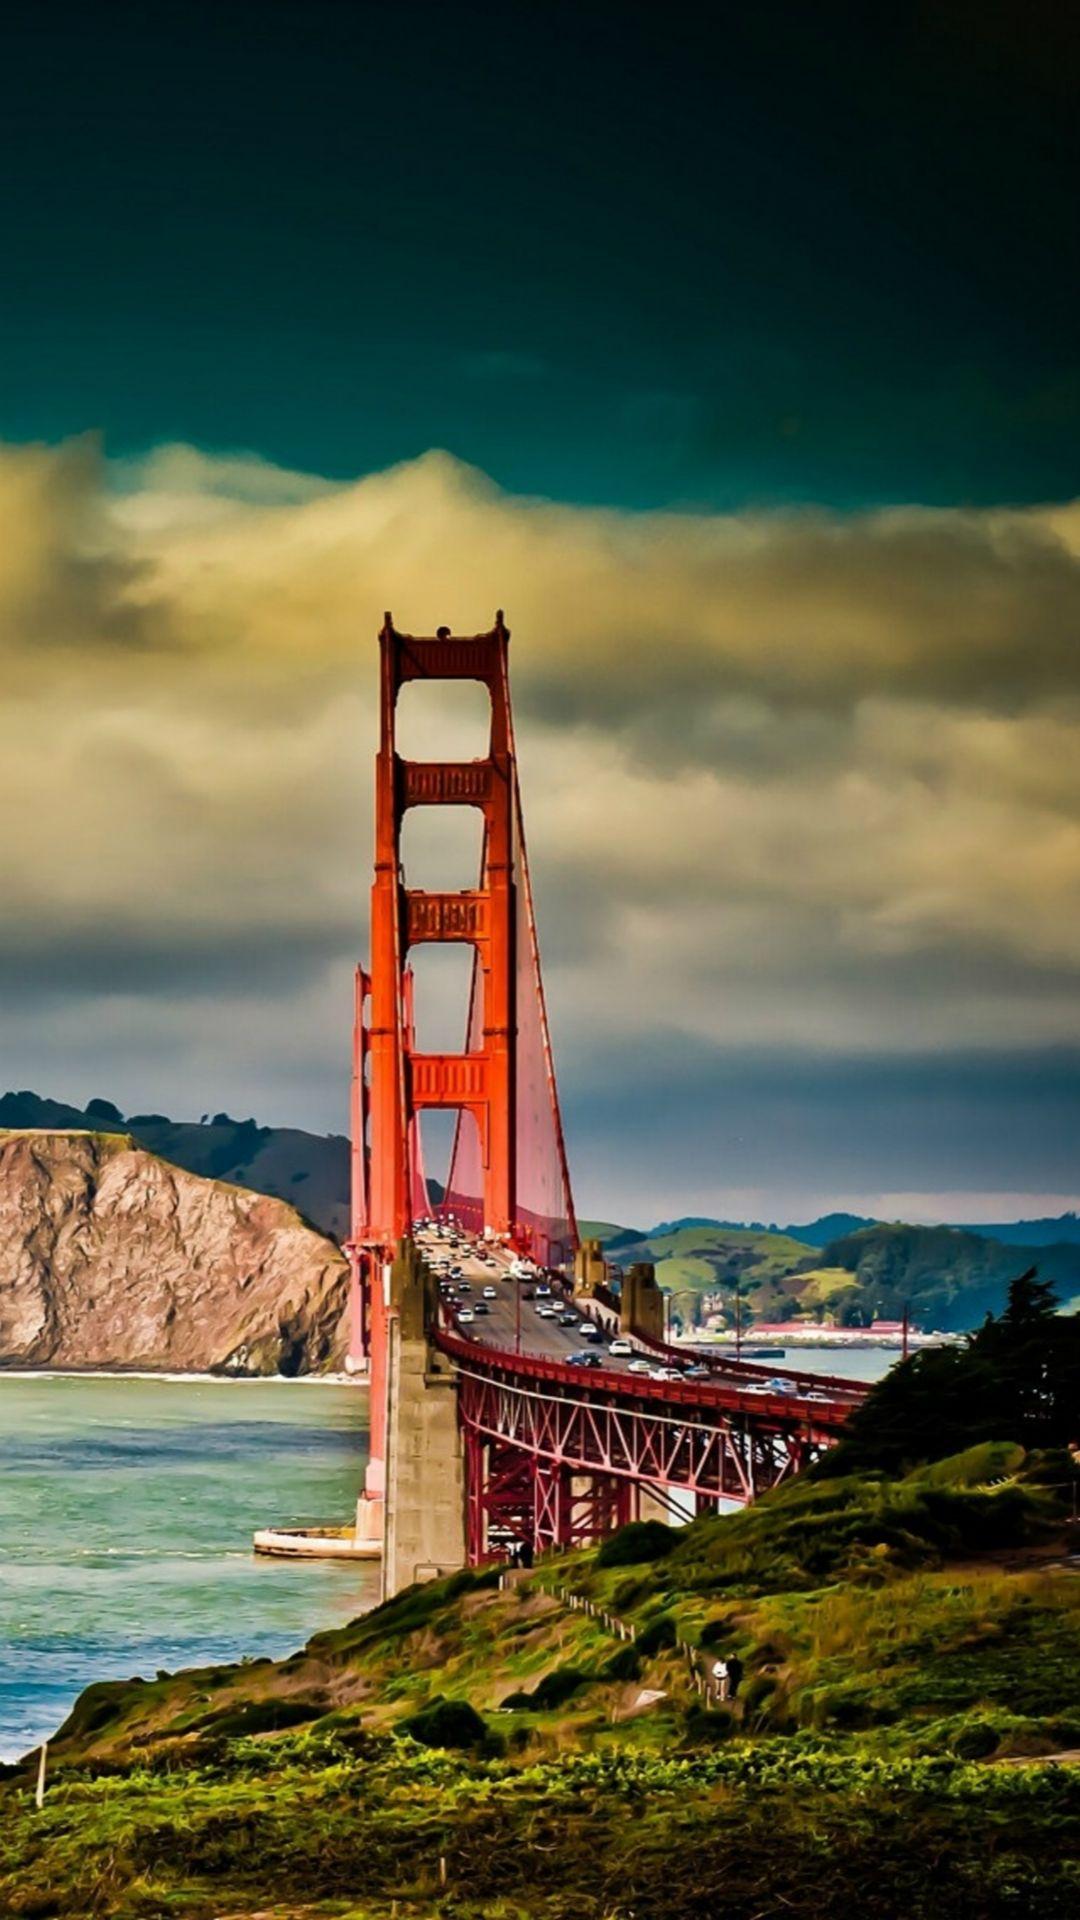 San Francisco Bridge Mountain Landscape Iphone 8 Wallpapers With Images San Francisco Bridge Bridge Wallpaper Golden Gate Bridge